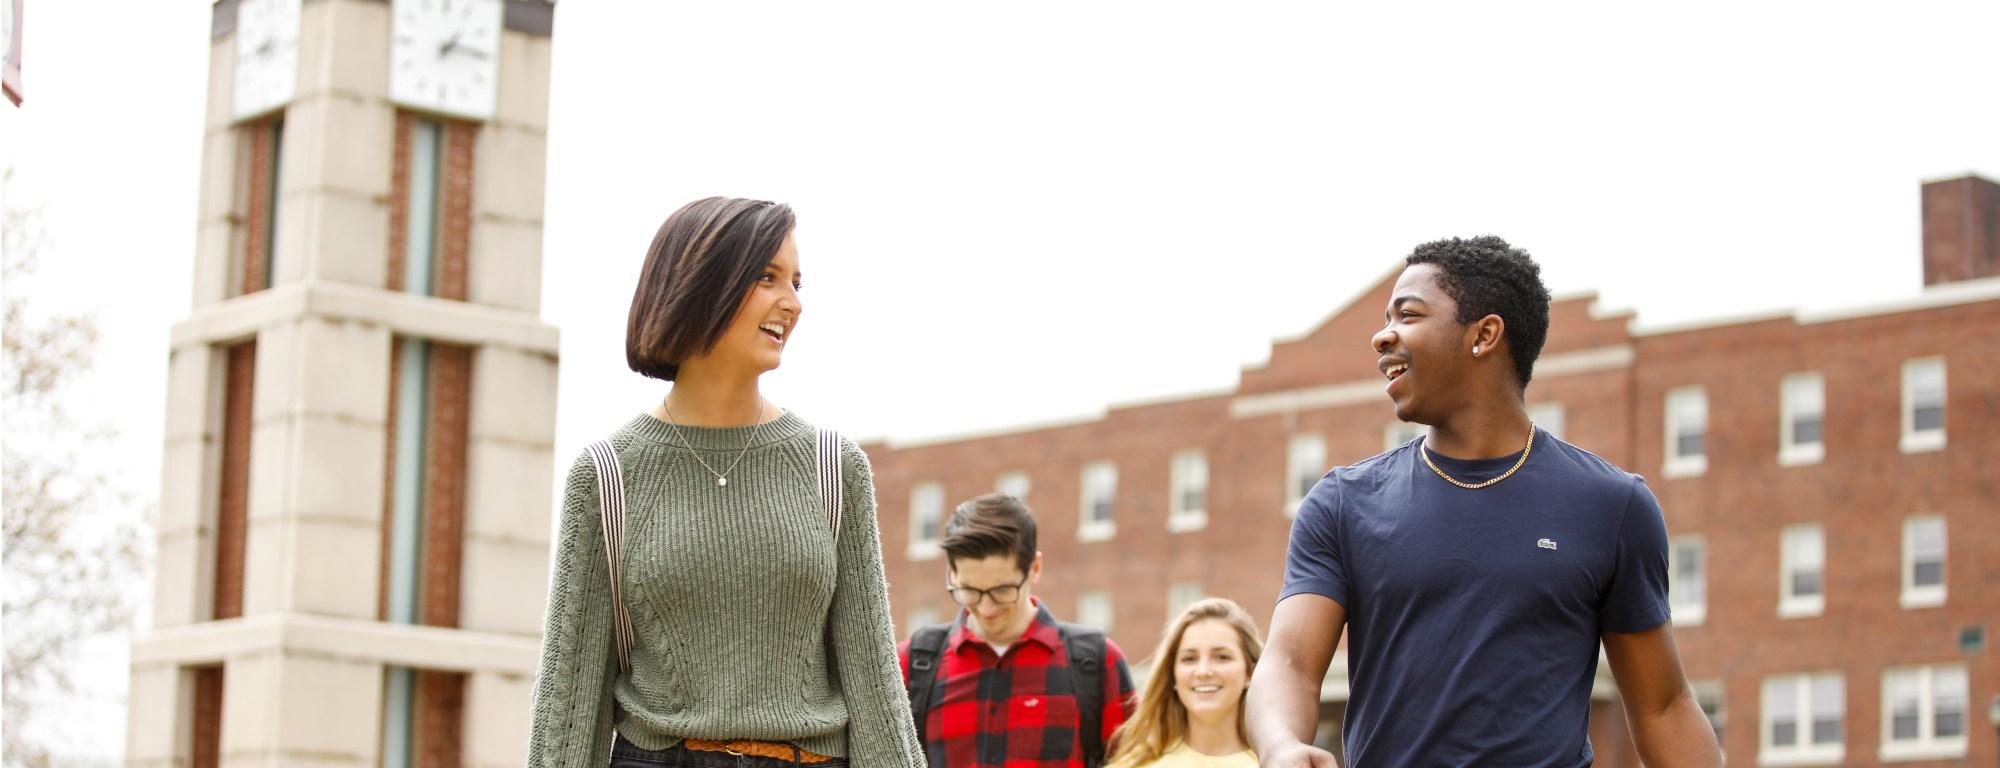 Students on Roberts Wesleyan campus